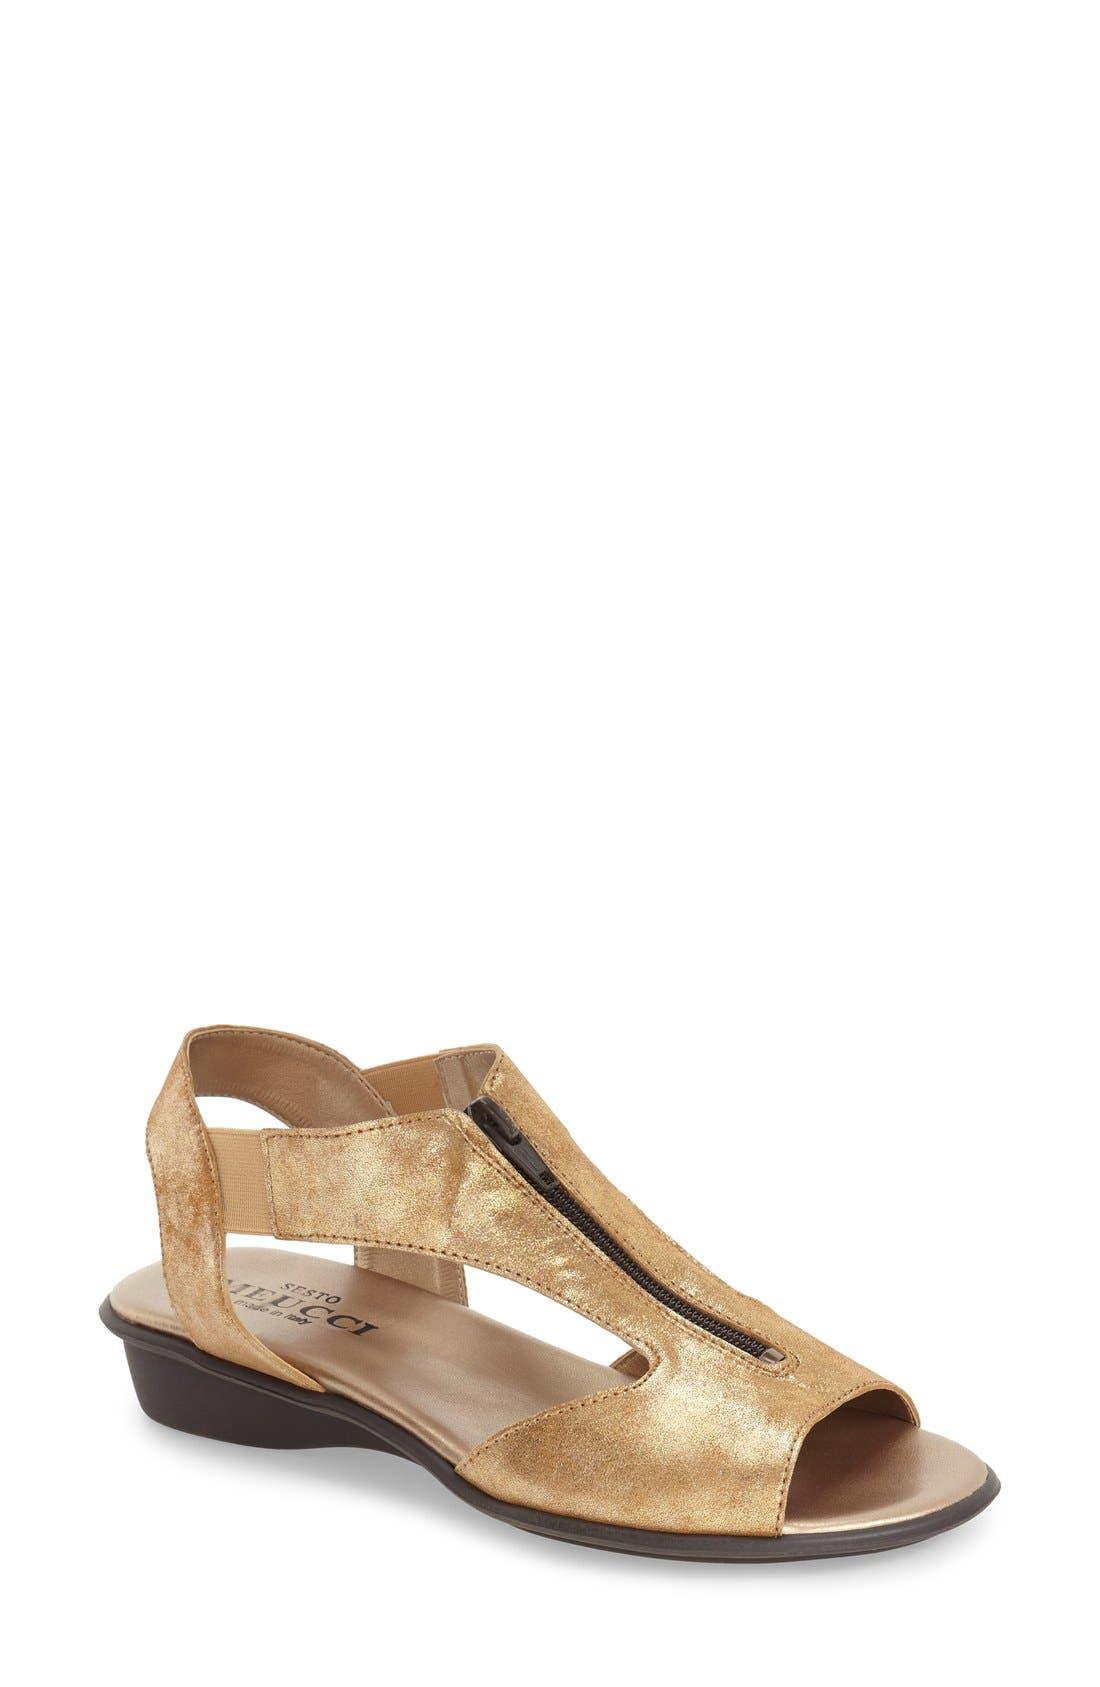 Main Image - Sesto Meucci 'Euclid' Sandal (Women)